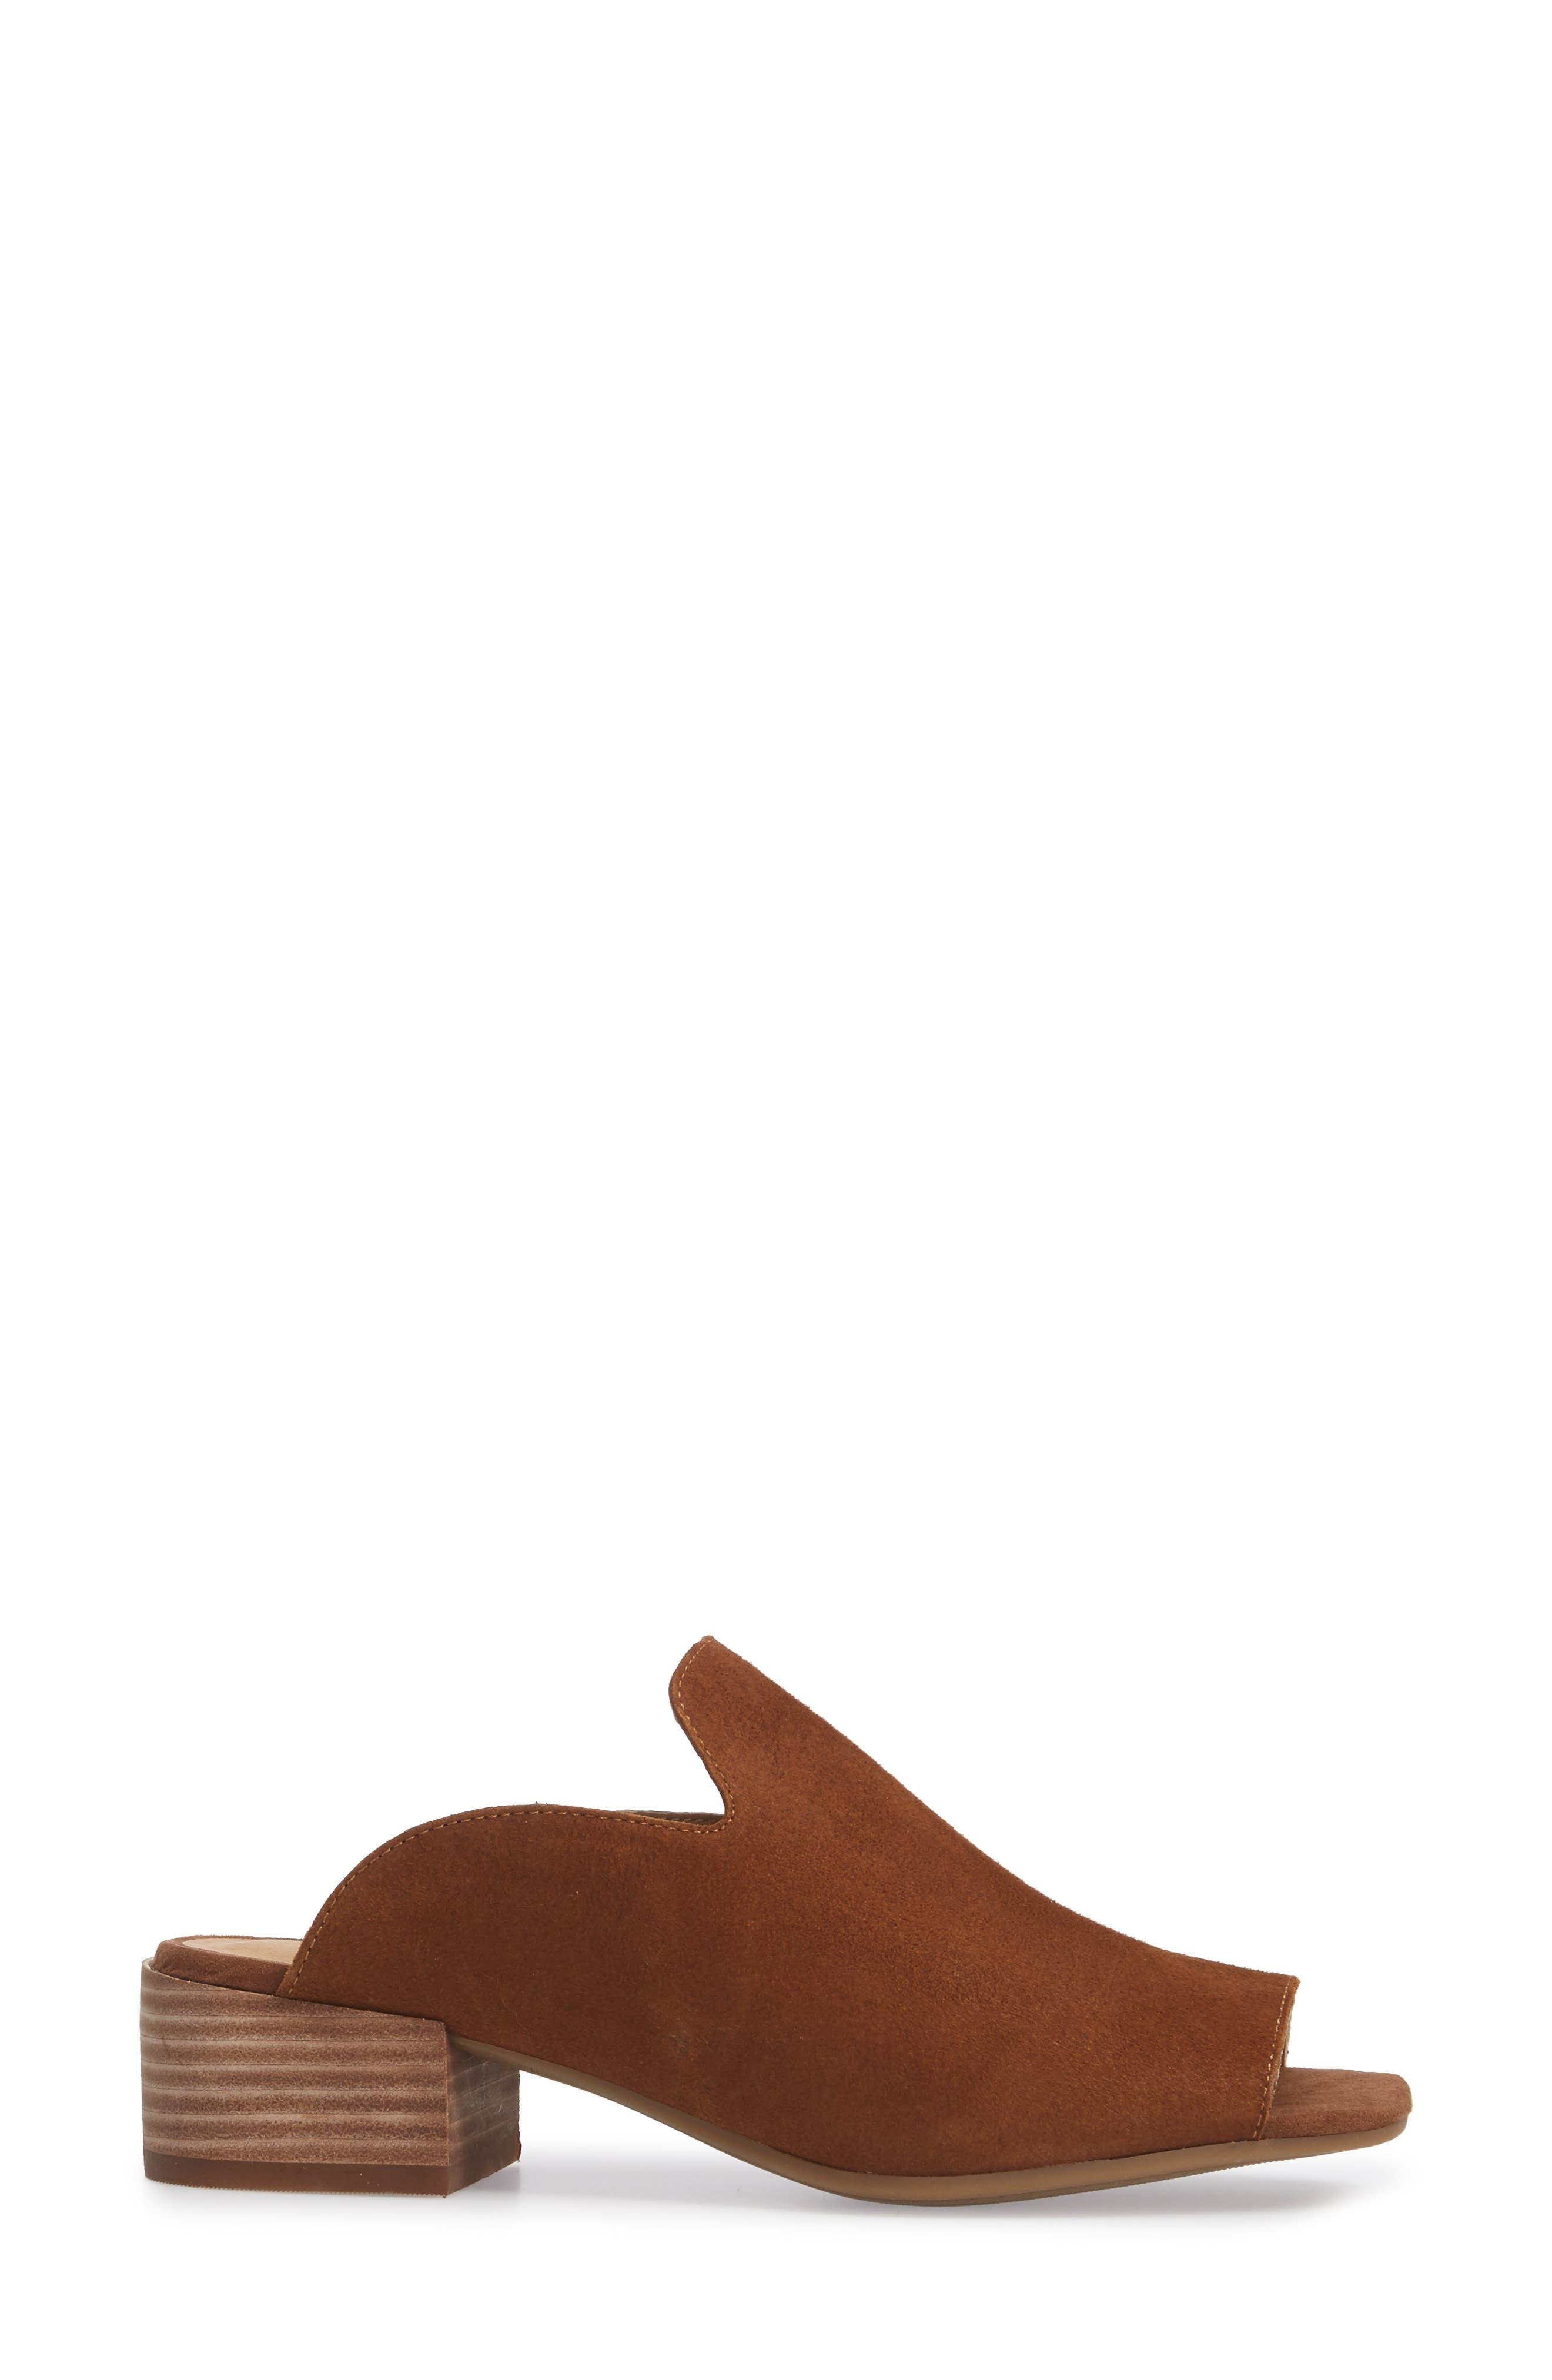 Noomrie Sandal,                             Alternate thumbnail 3, color,                             Cedar Leather